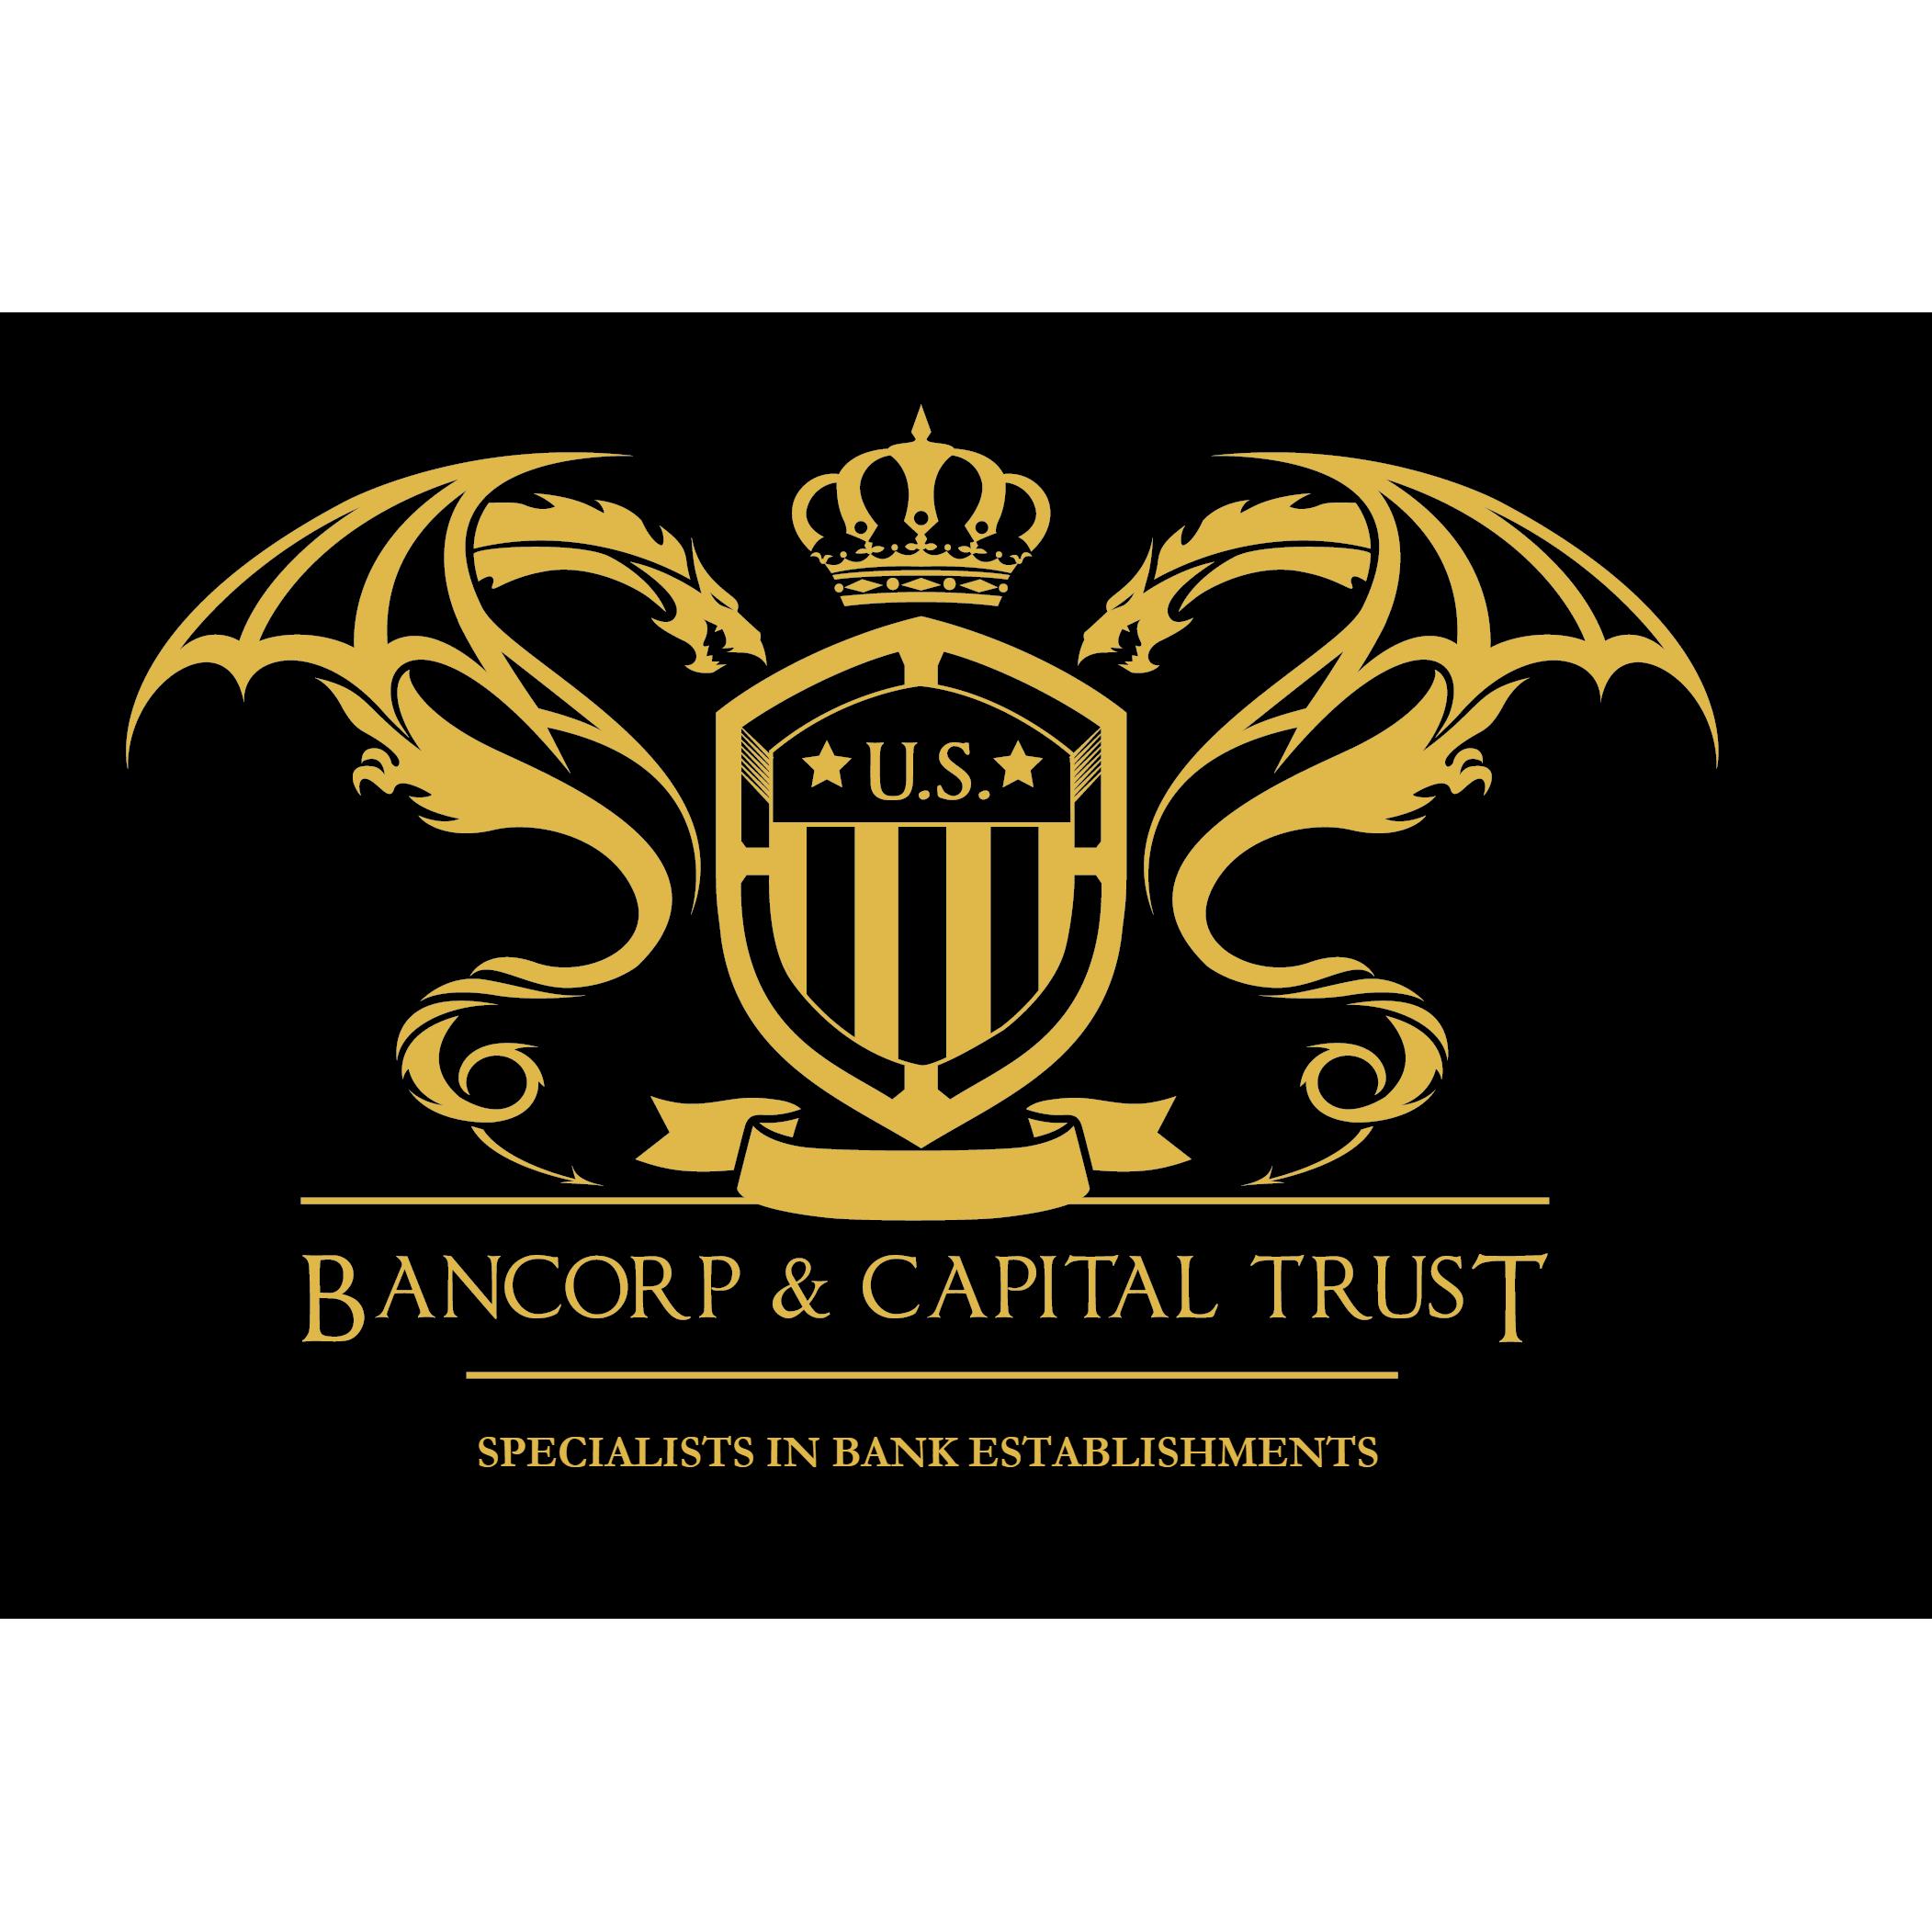 U.S. Bancorp  and  Capital Trust